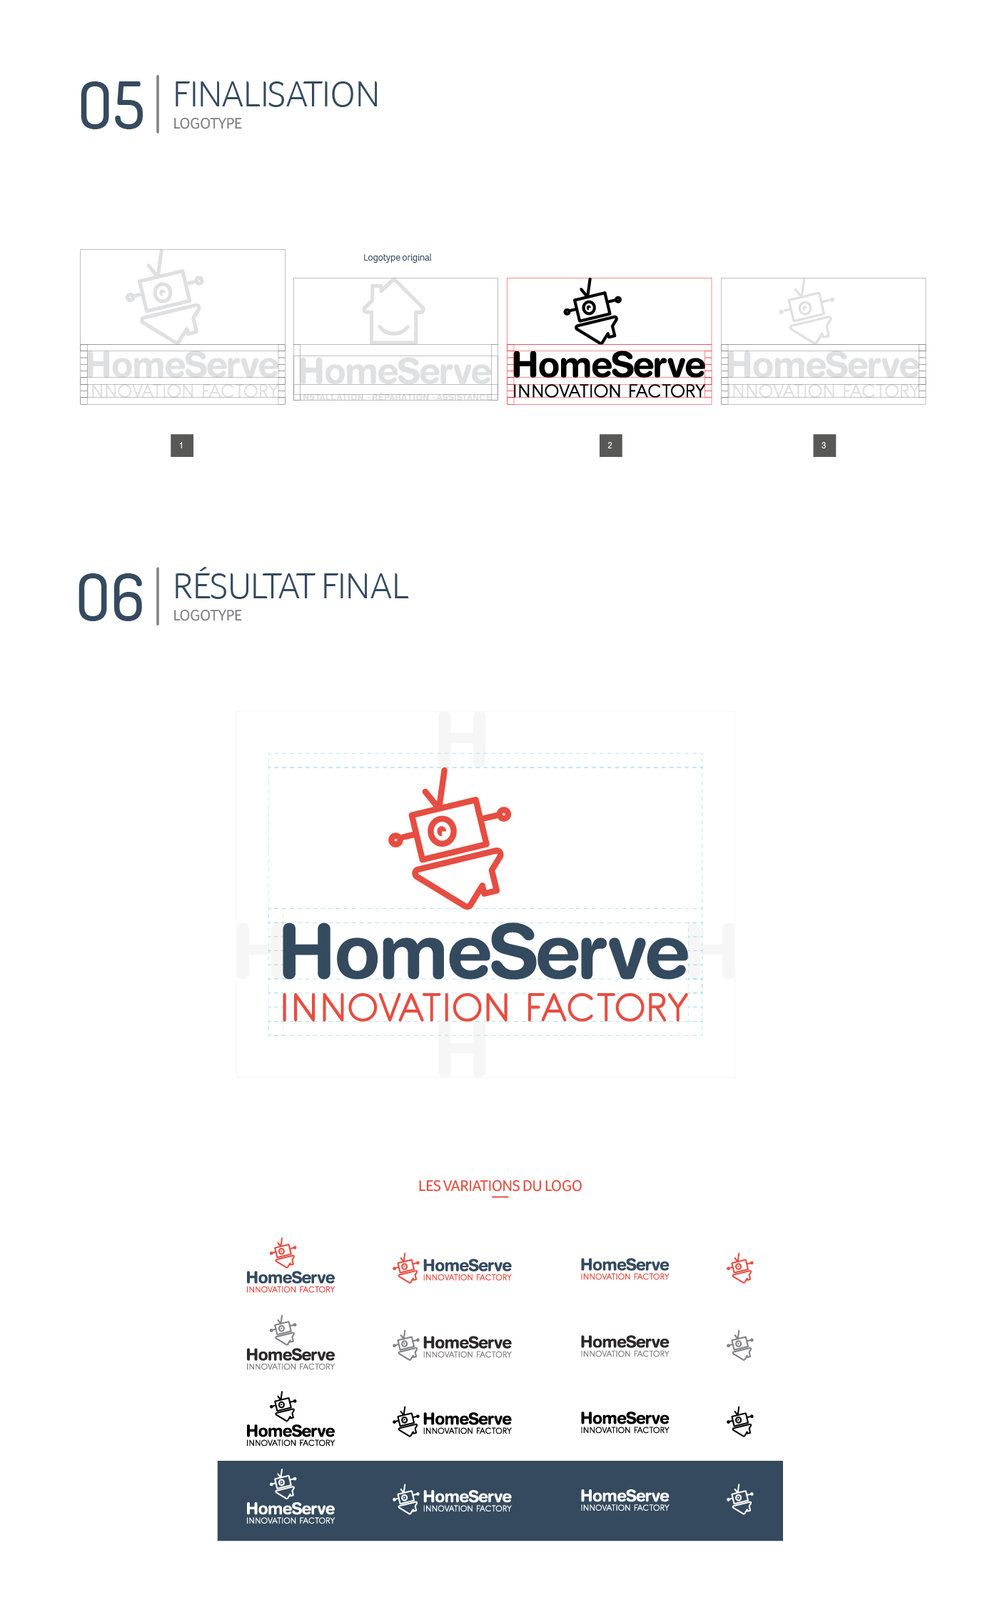 2-homeserve-innovation-factory-assurance_design_graphiqee_logotype_final_construction_variations.jpg